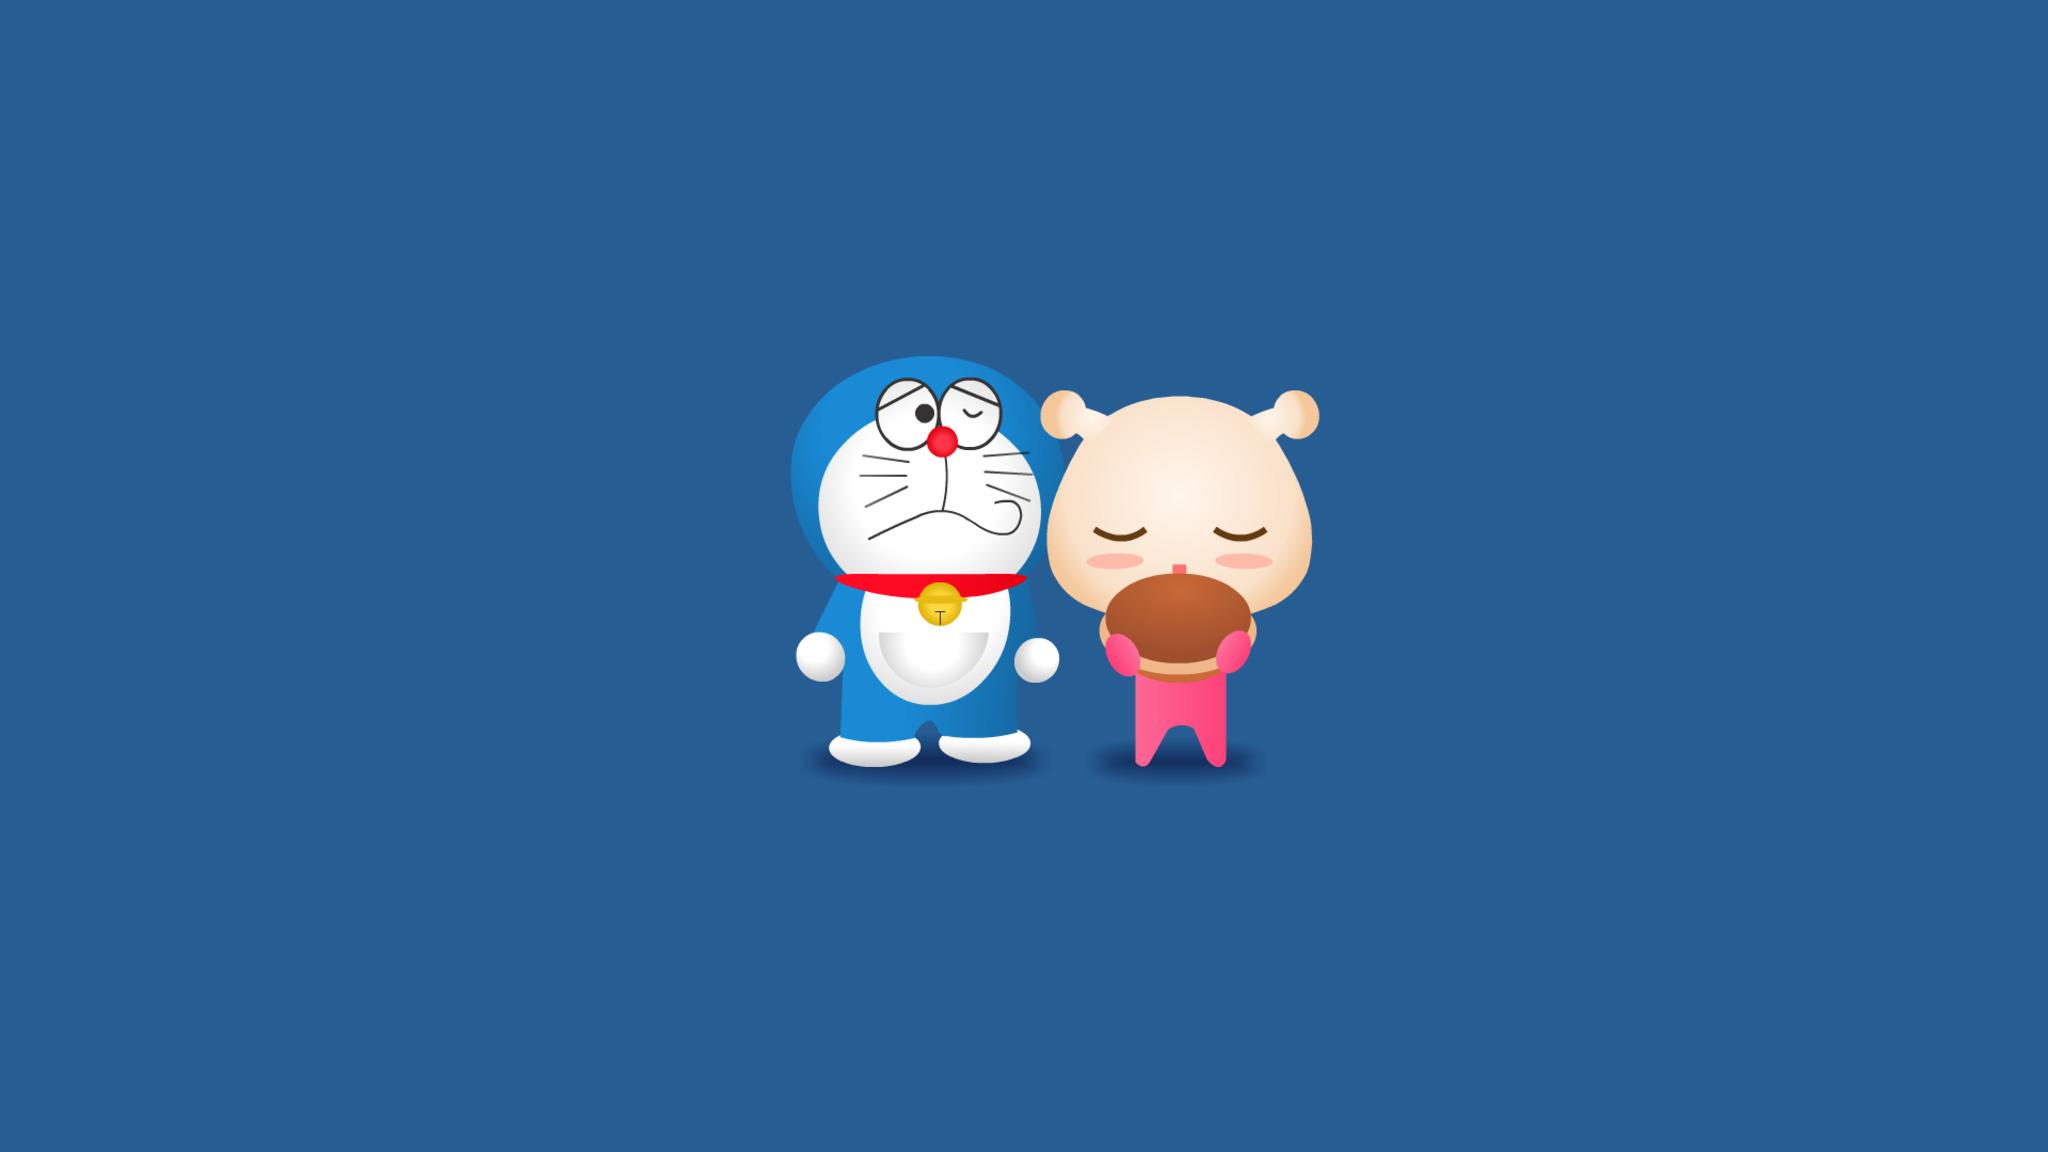 Marvel Superheroes 3d Wallpapers 2048x1152 Doraemon Minimalism 2048x1152 Resolution Hd 4k